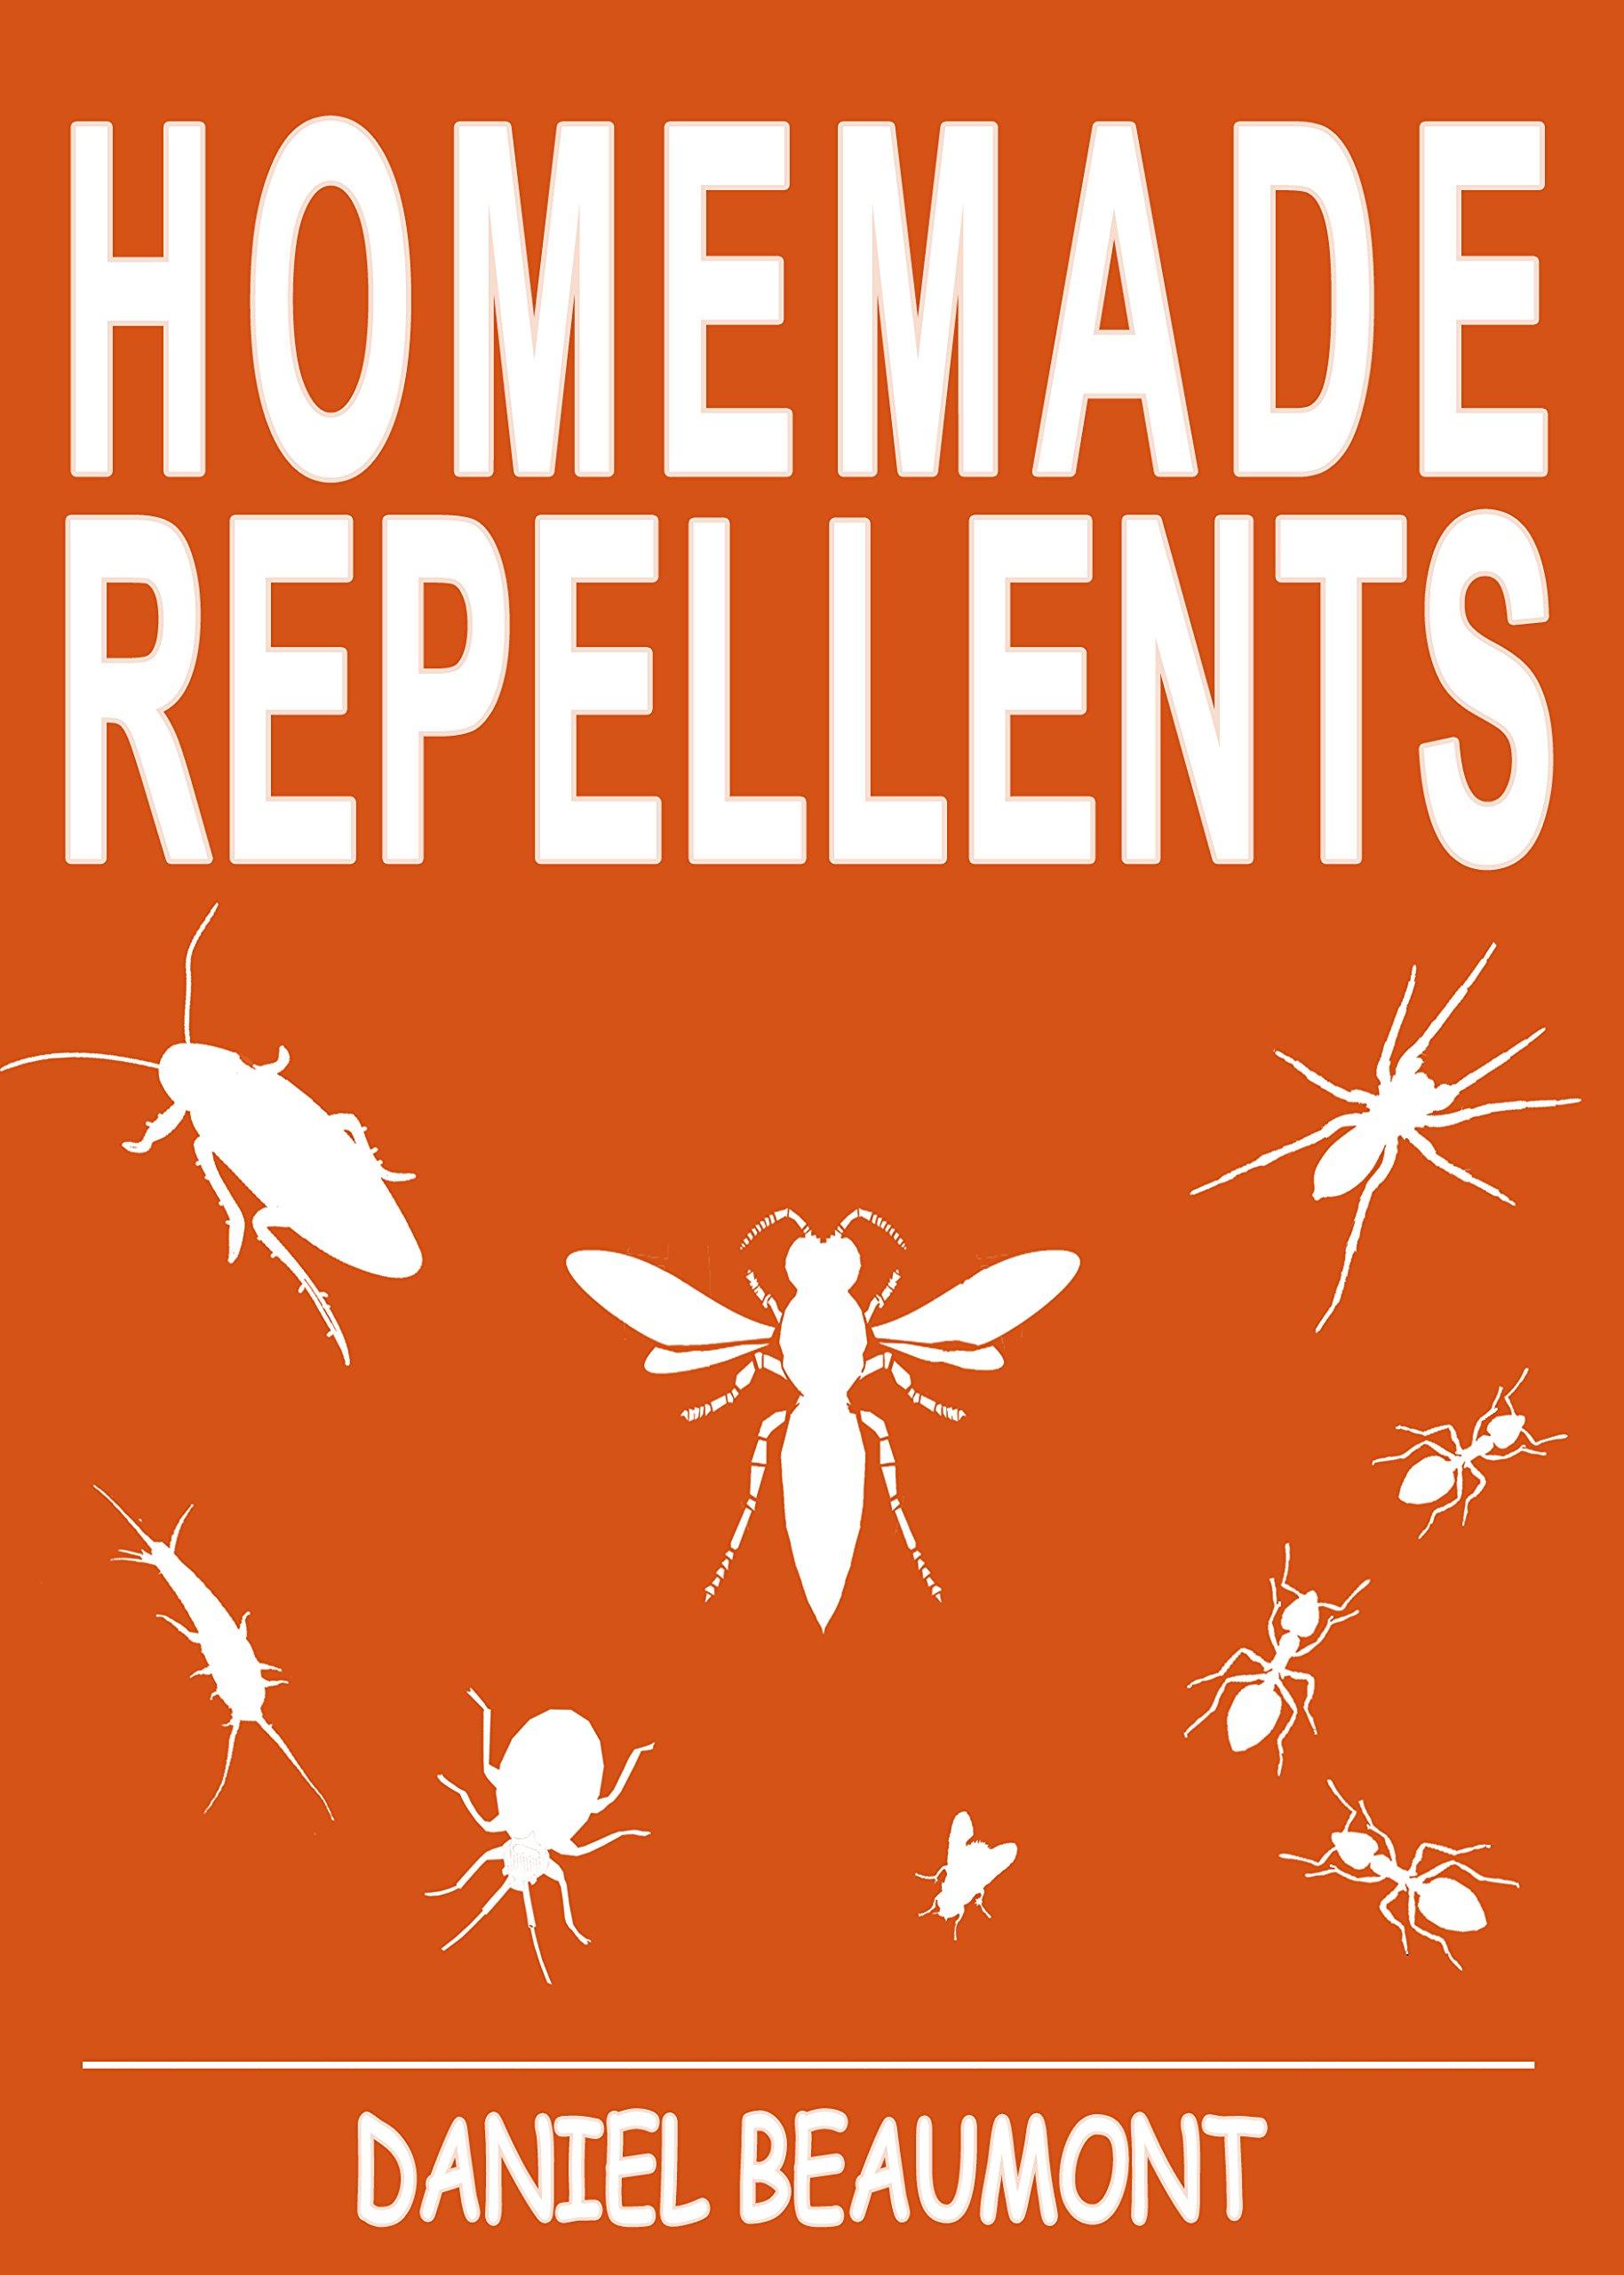 Homemade Repellents Organic Natural Remedies ebook